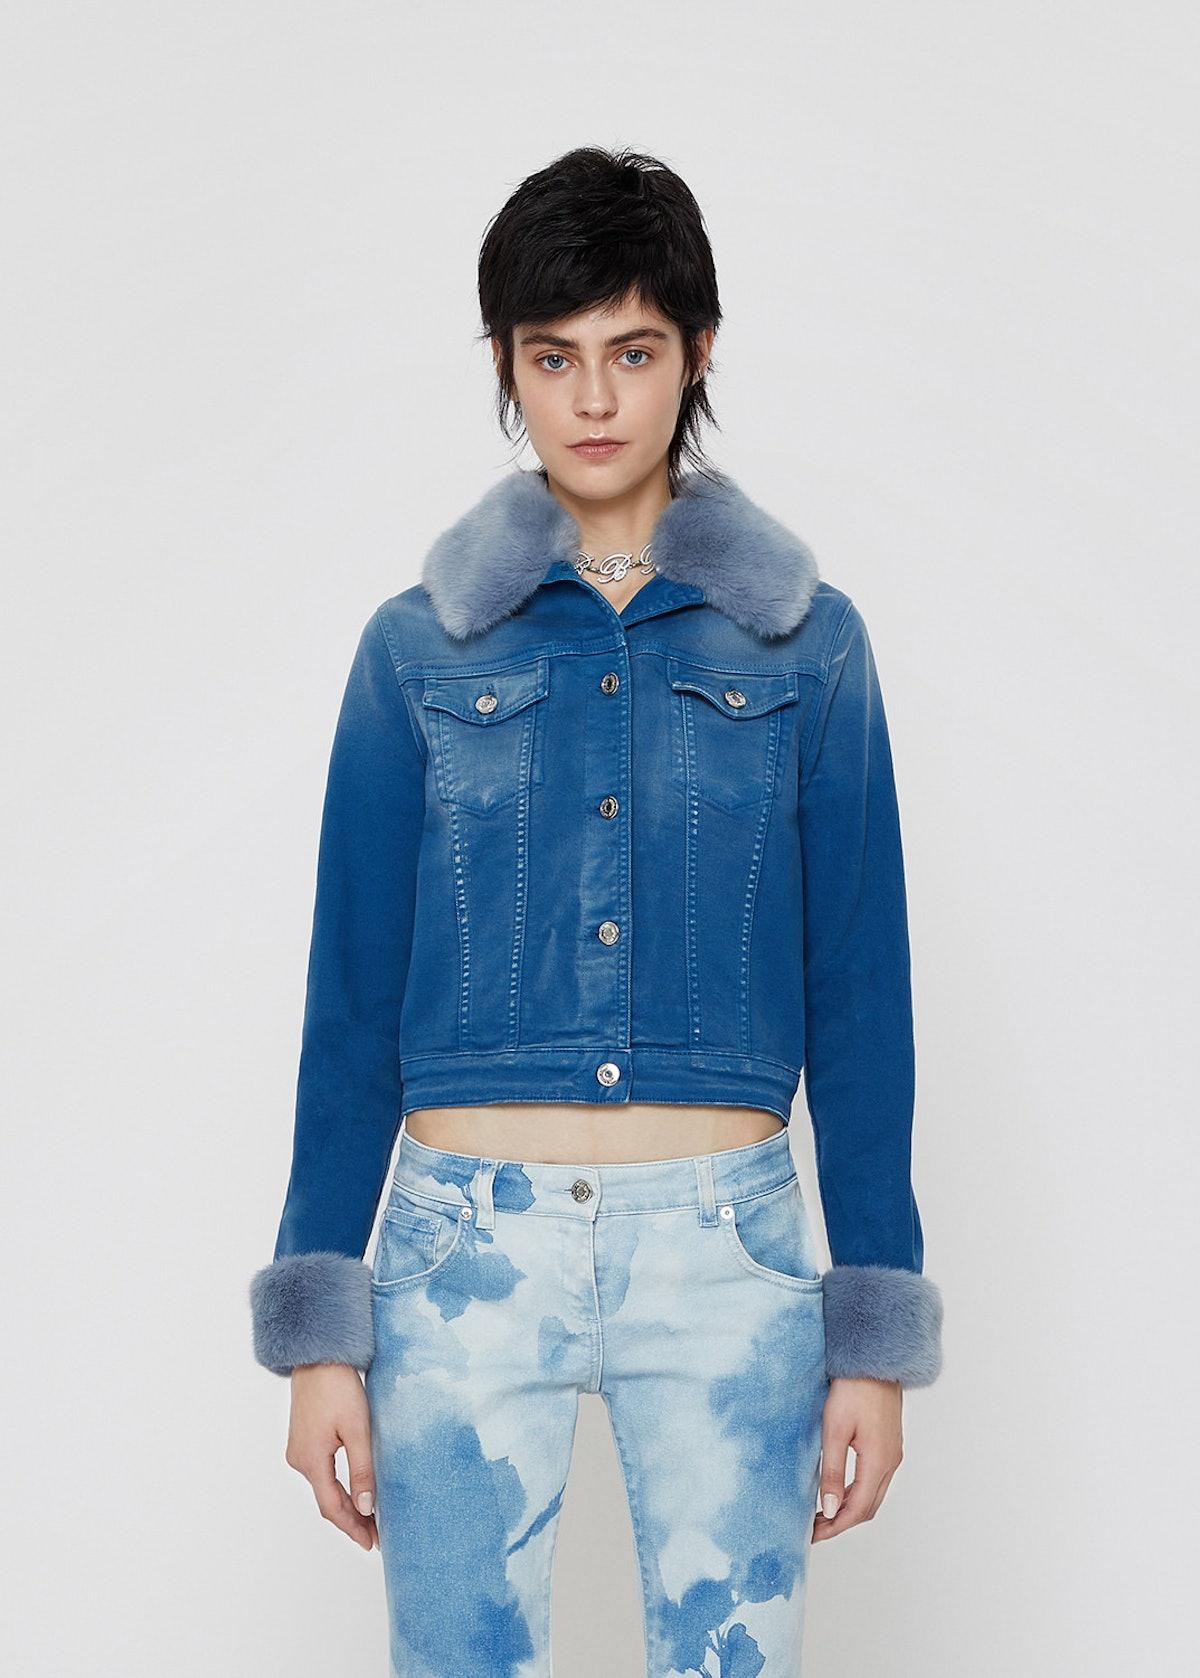 Blumarine Jean Jacket With Eco- Fur Fur Trimmed